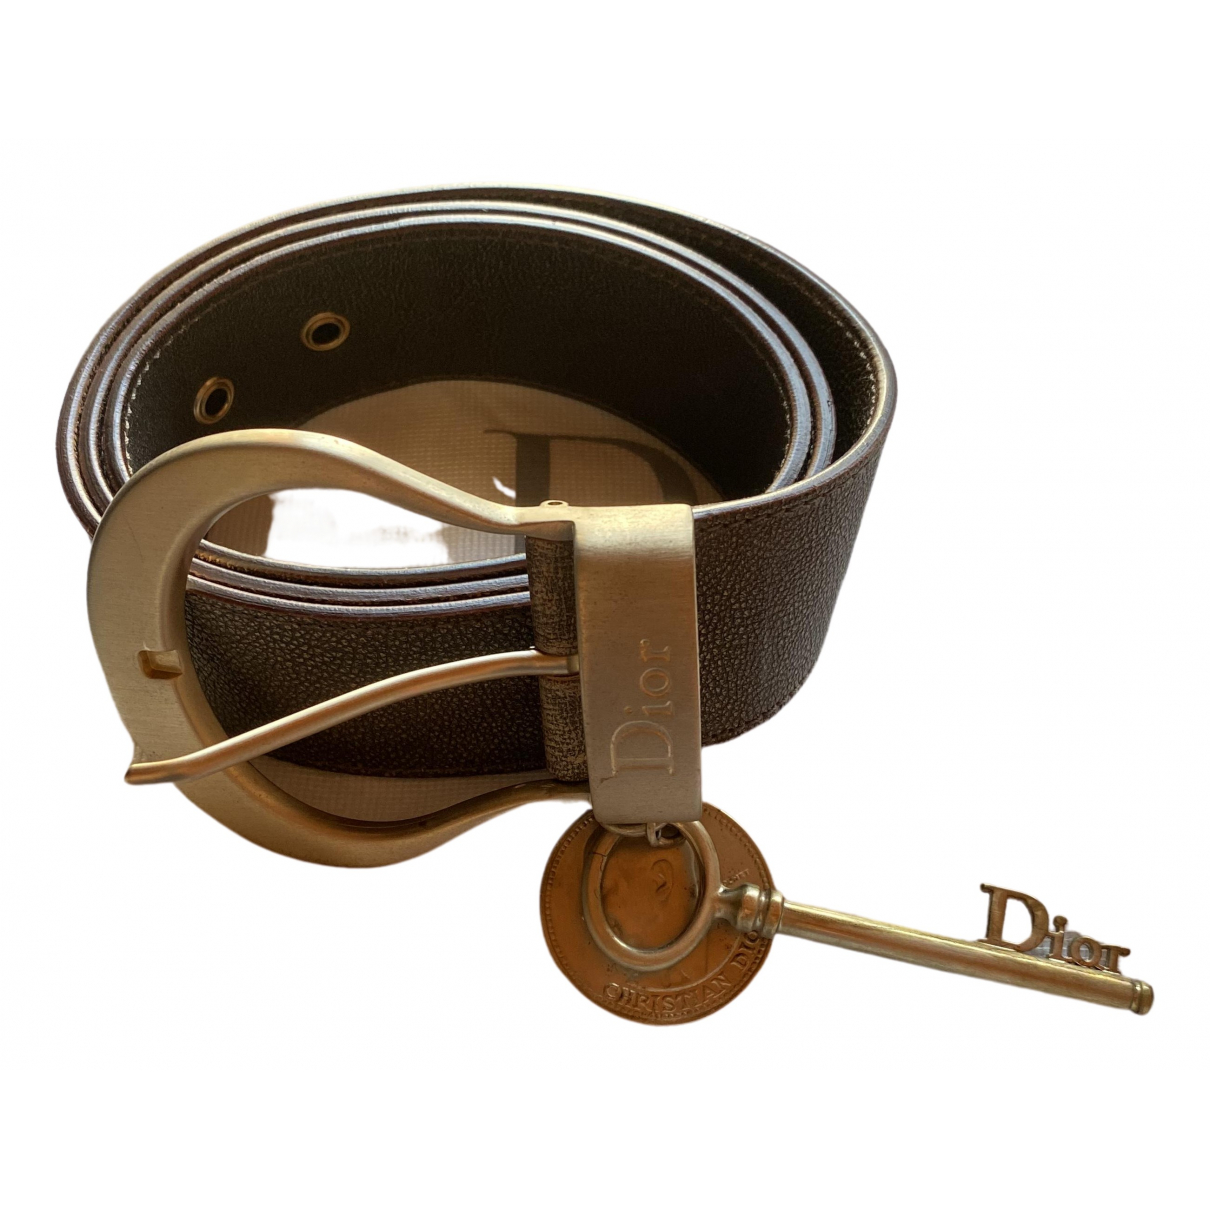 Dior \N Metallic Leather belt for Women 90 cm